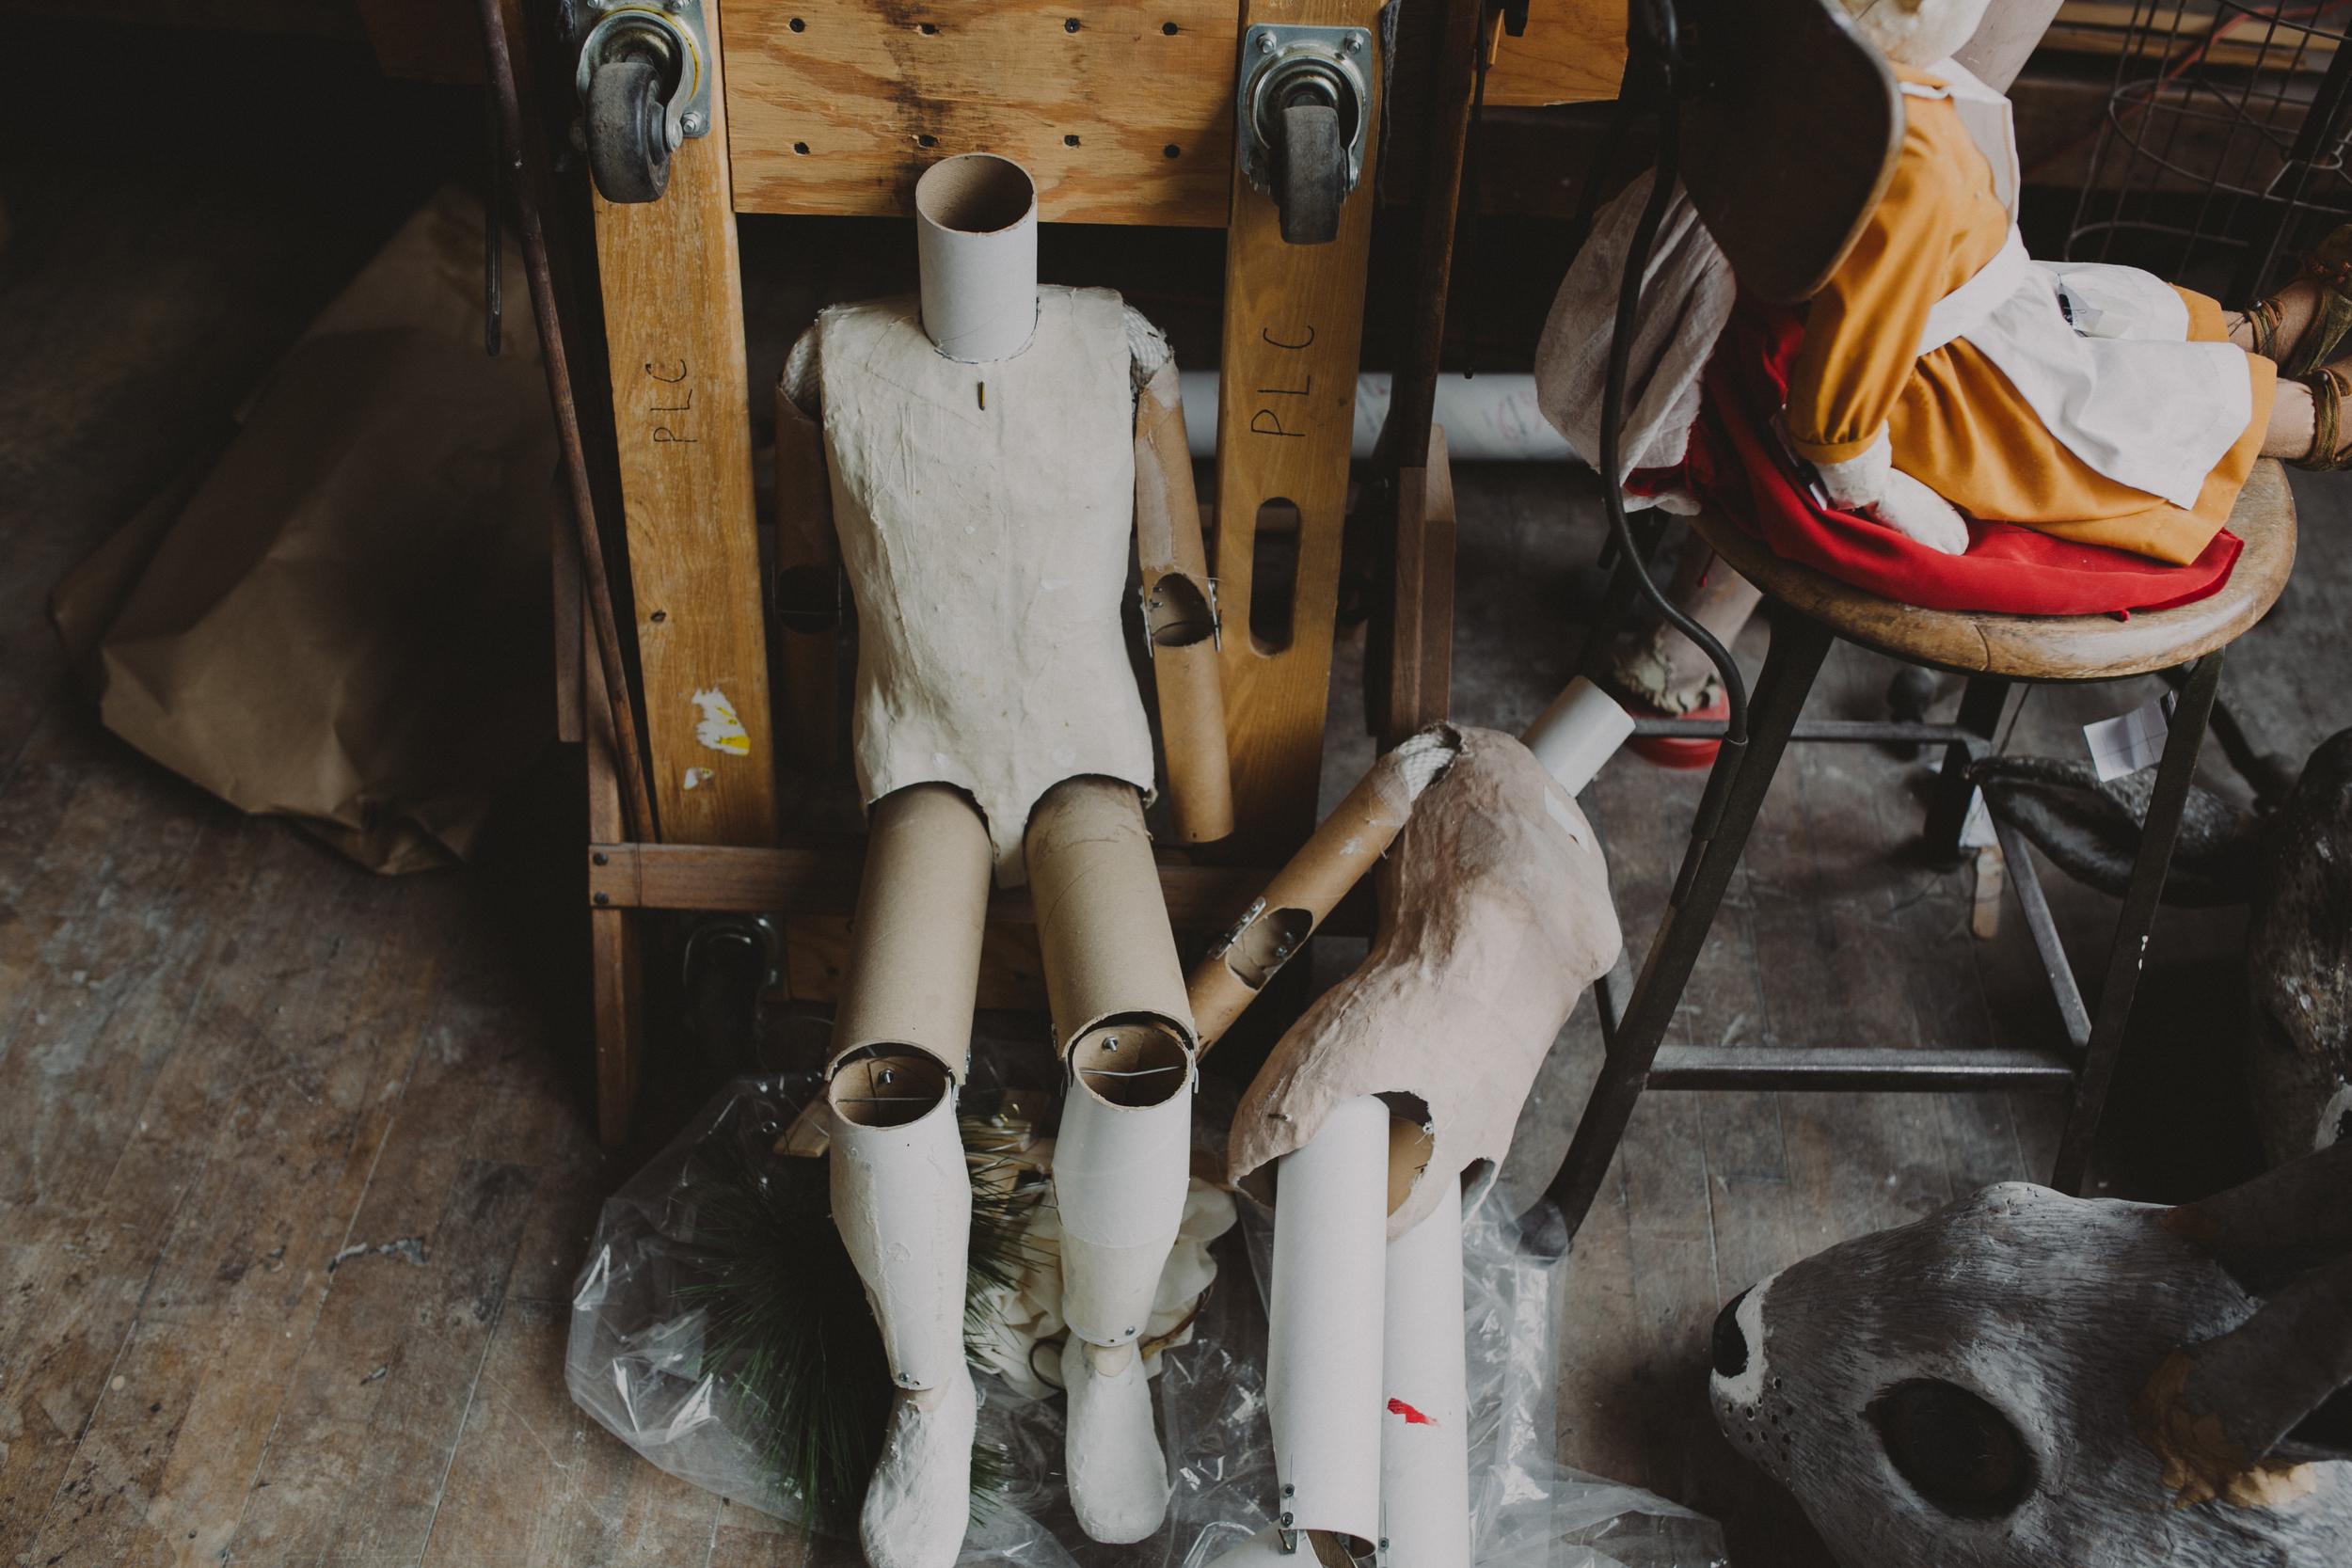 bogart portraits meet the michaels phantom limb 1927.JPG